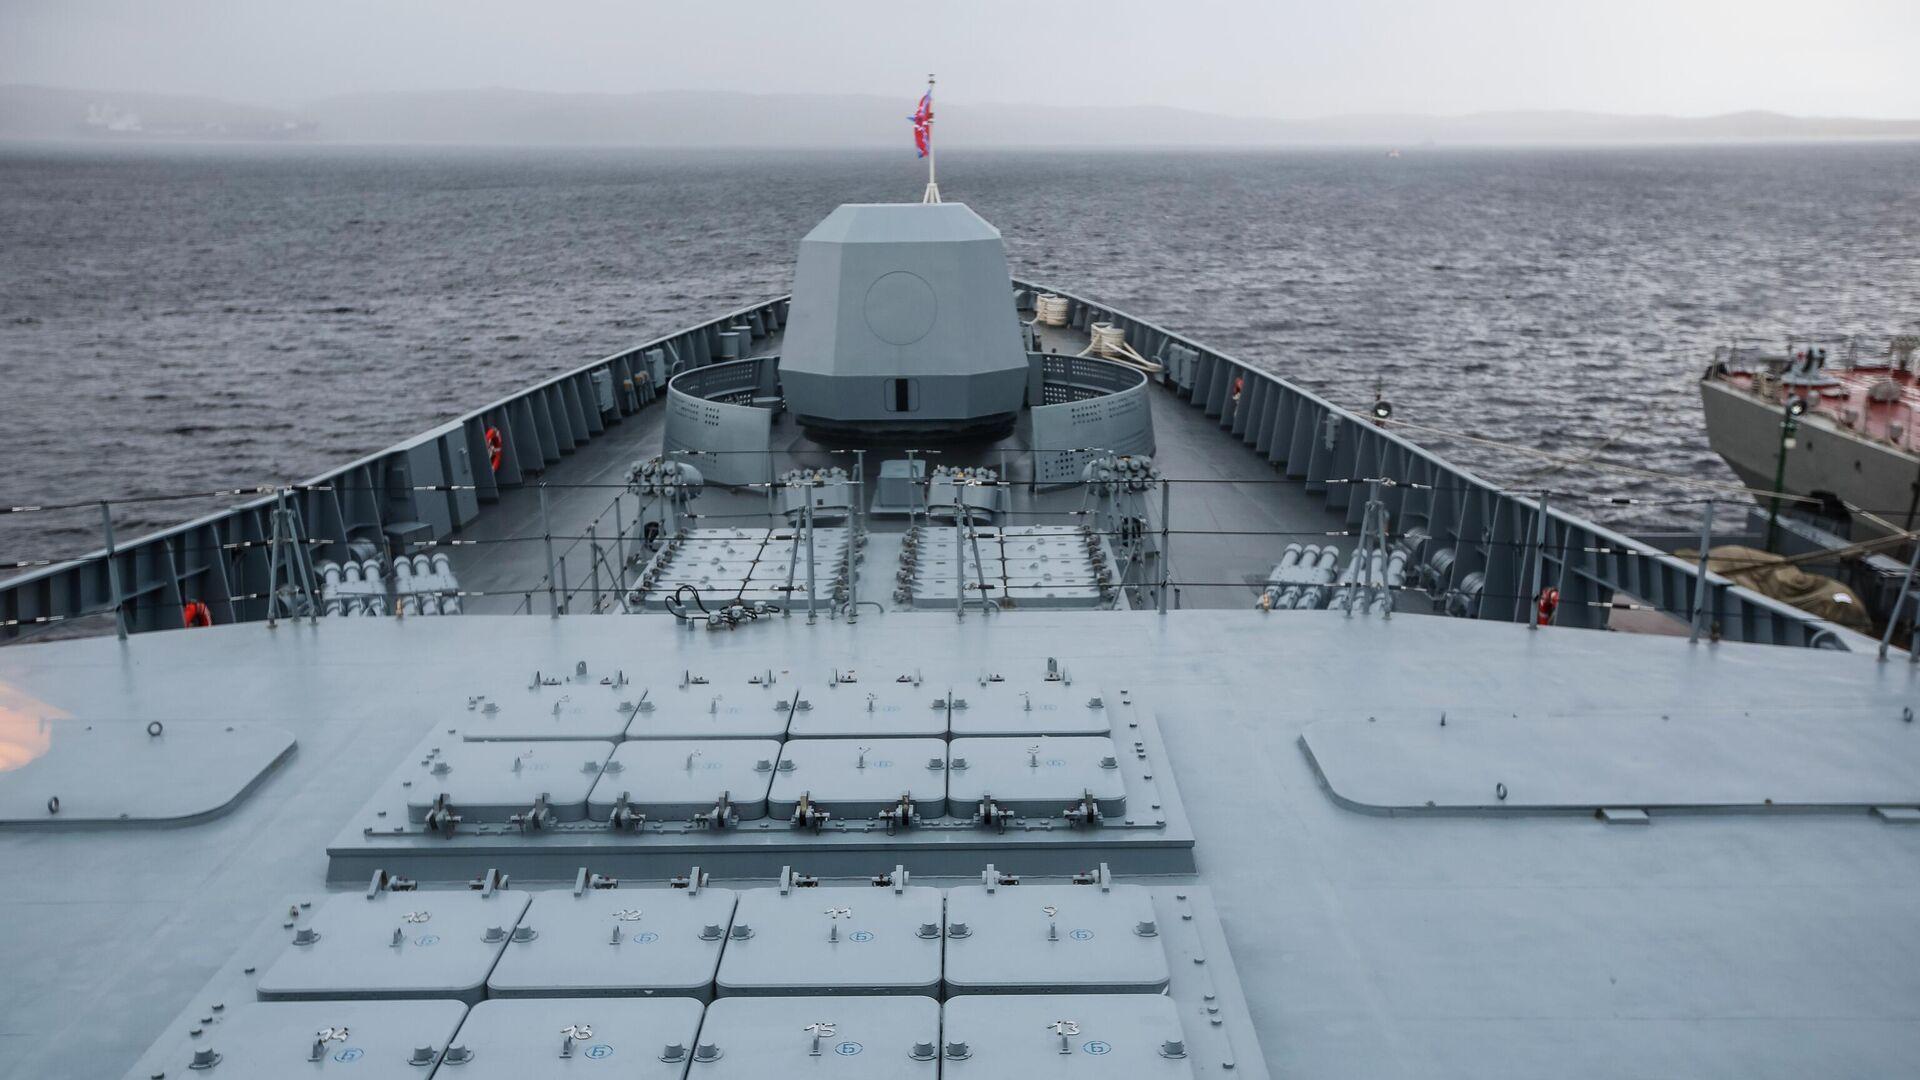 Пусковые шахты ракет Калибр на борту фрегата проекта 22350 Адмирал флота Касатонов в порту Североморска - РИА Новости, 1920, 23.09.2020